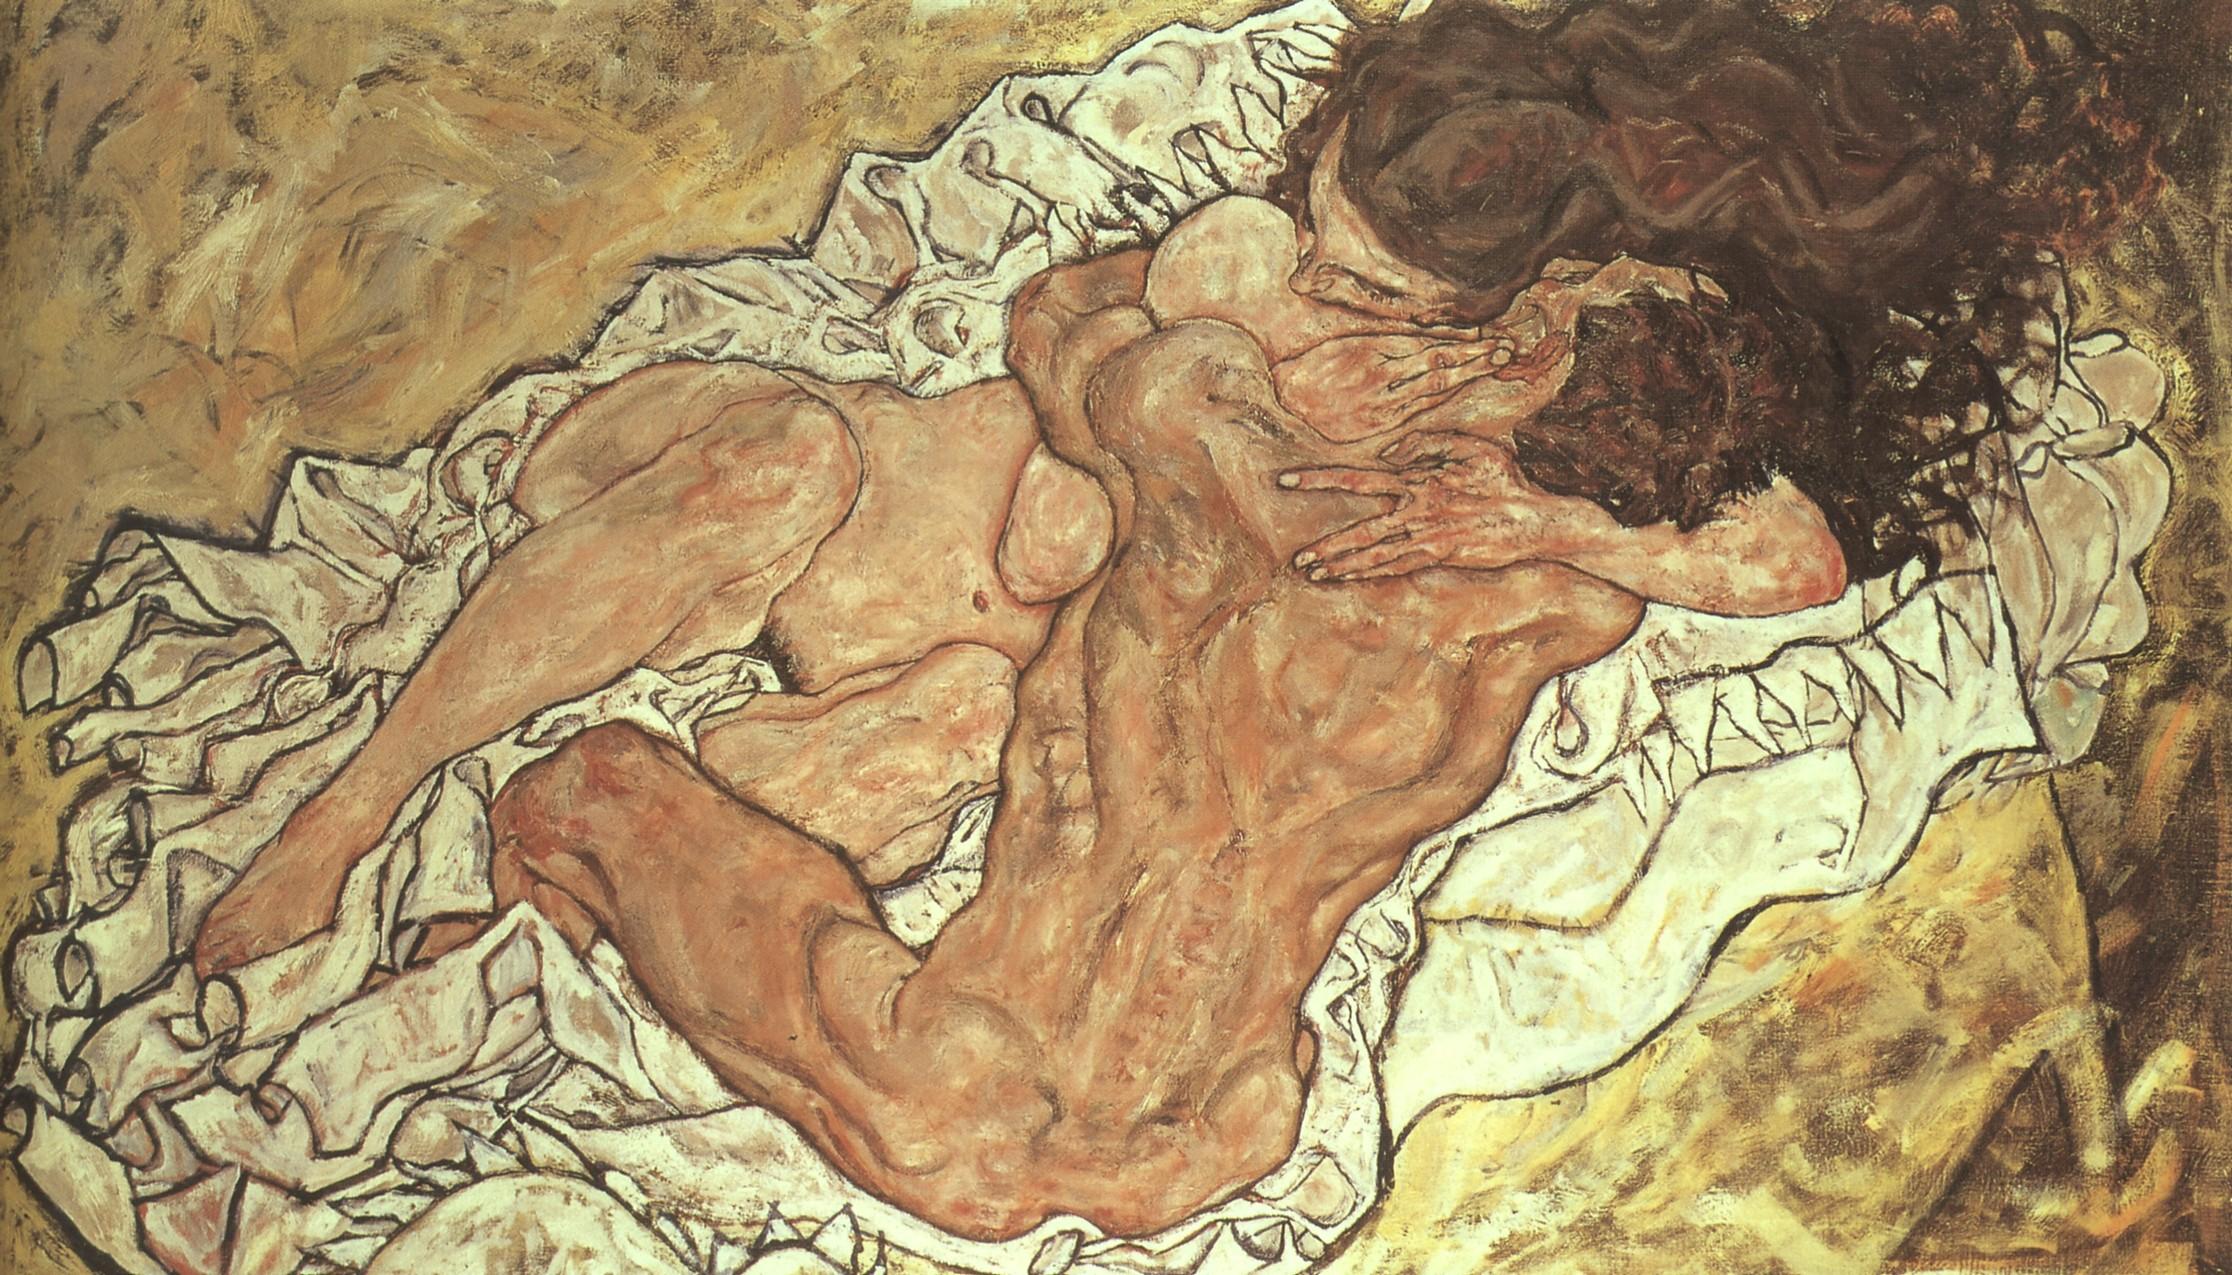 Egon Schiele, Die Umarmung - 1917